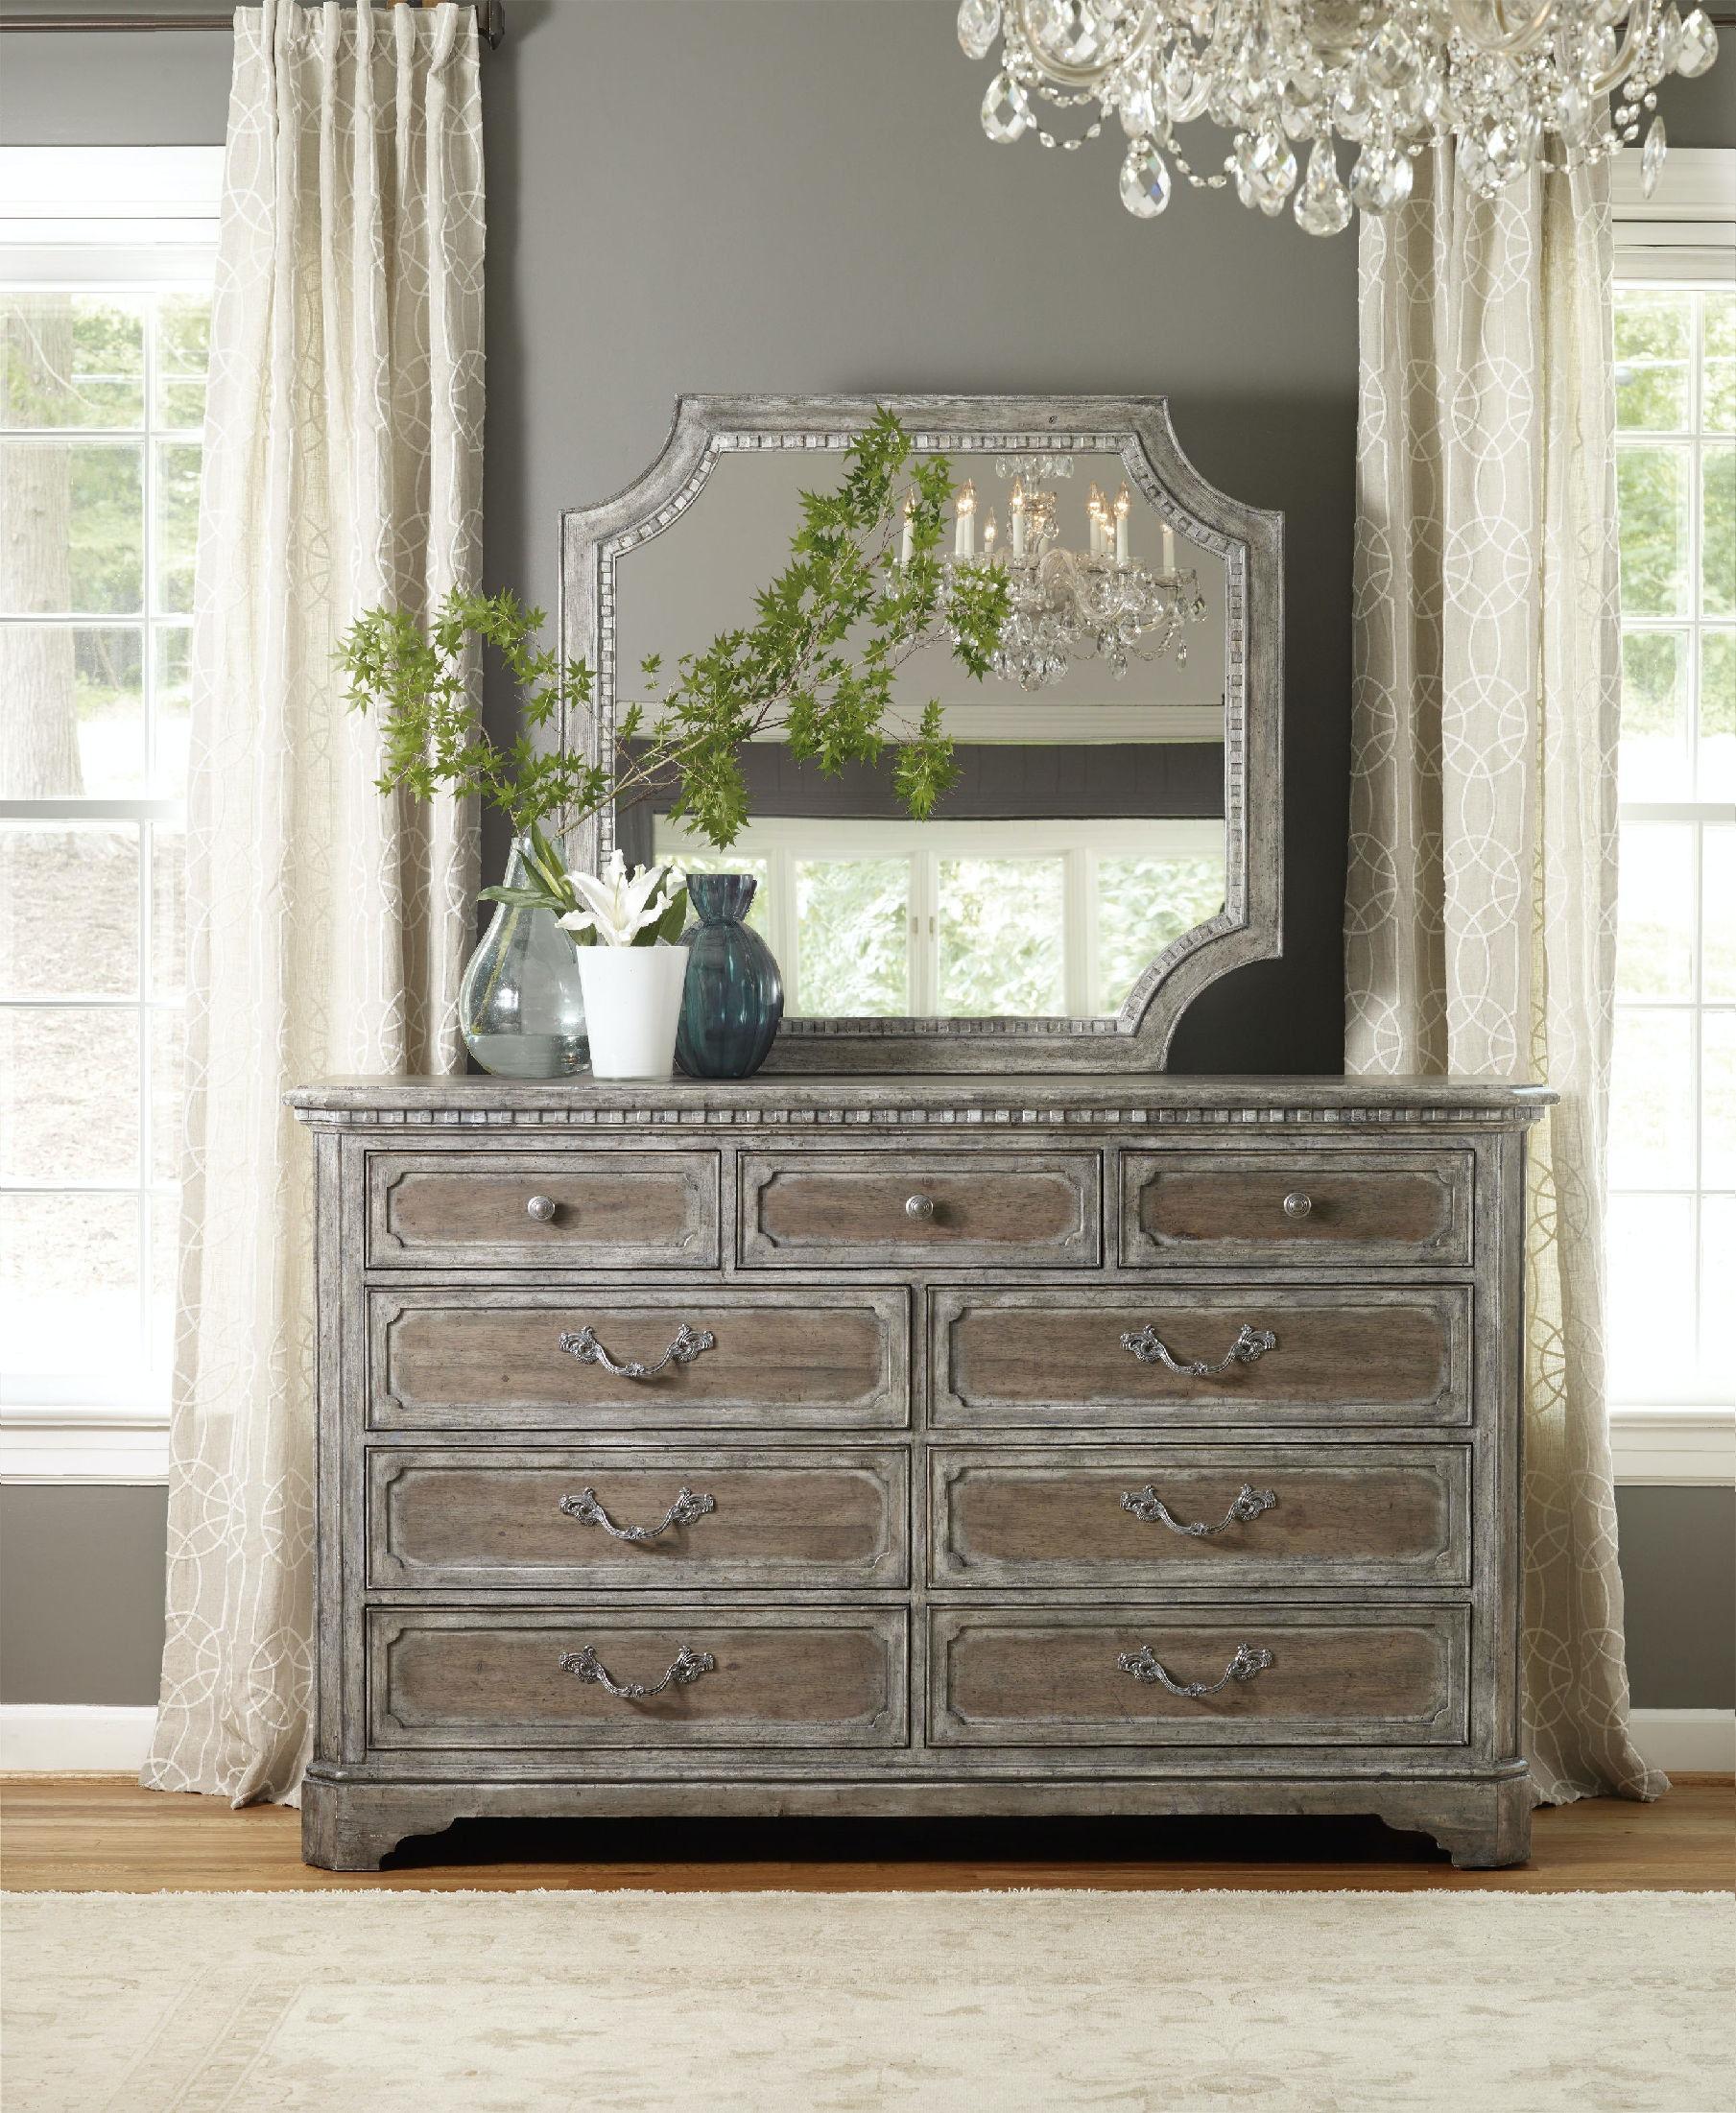 Hooker Furniture True Vintage Shaped Mirror 5701 90008